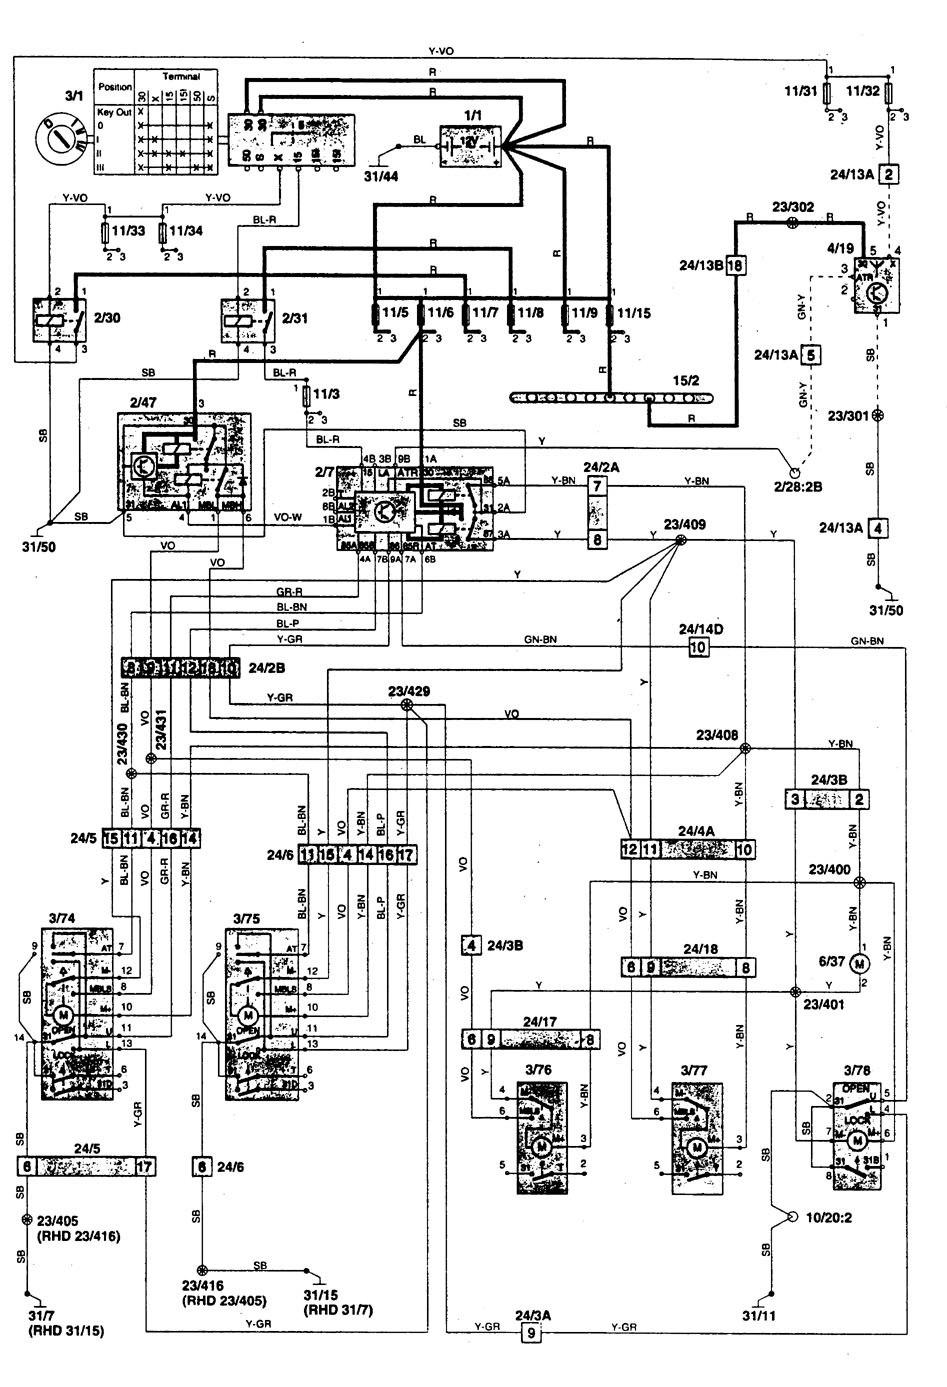 Ford Taurus Wiring Diagram Volvo 850 Starter Wiring 1993 Ford Taurus